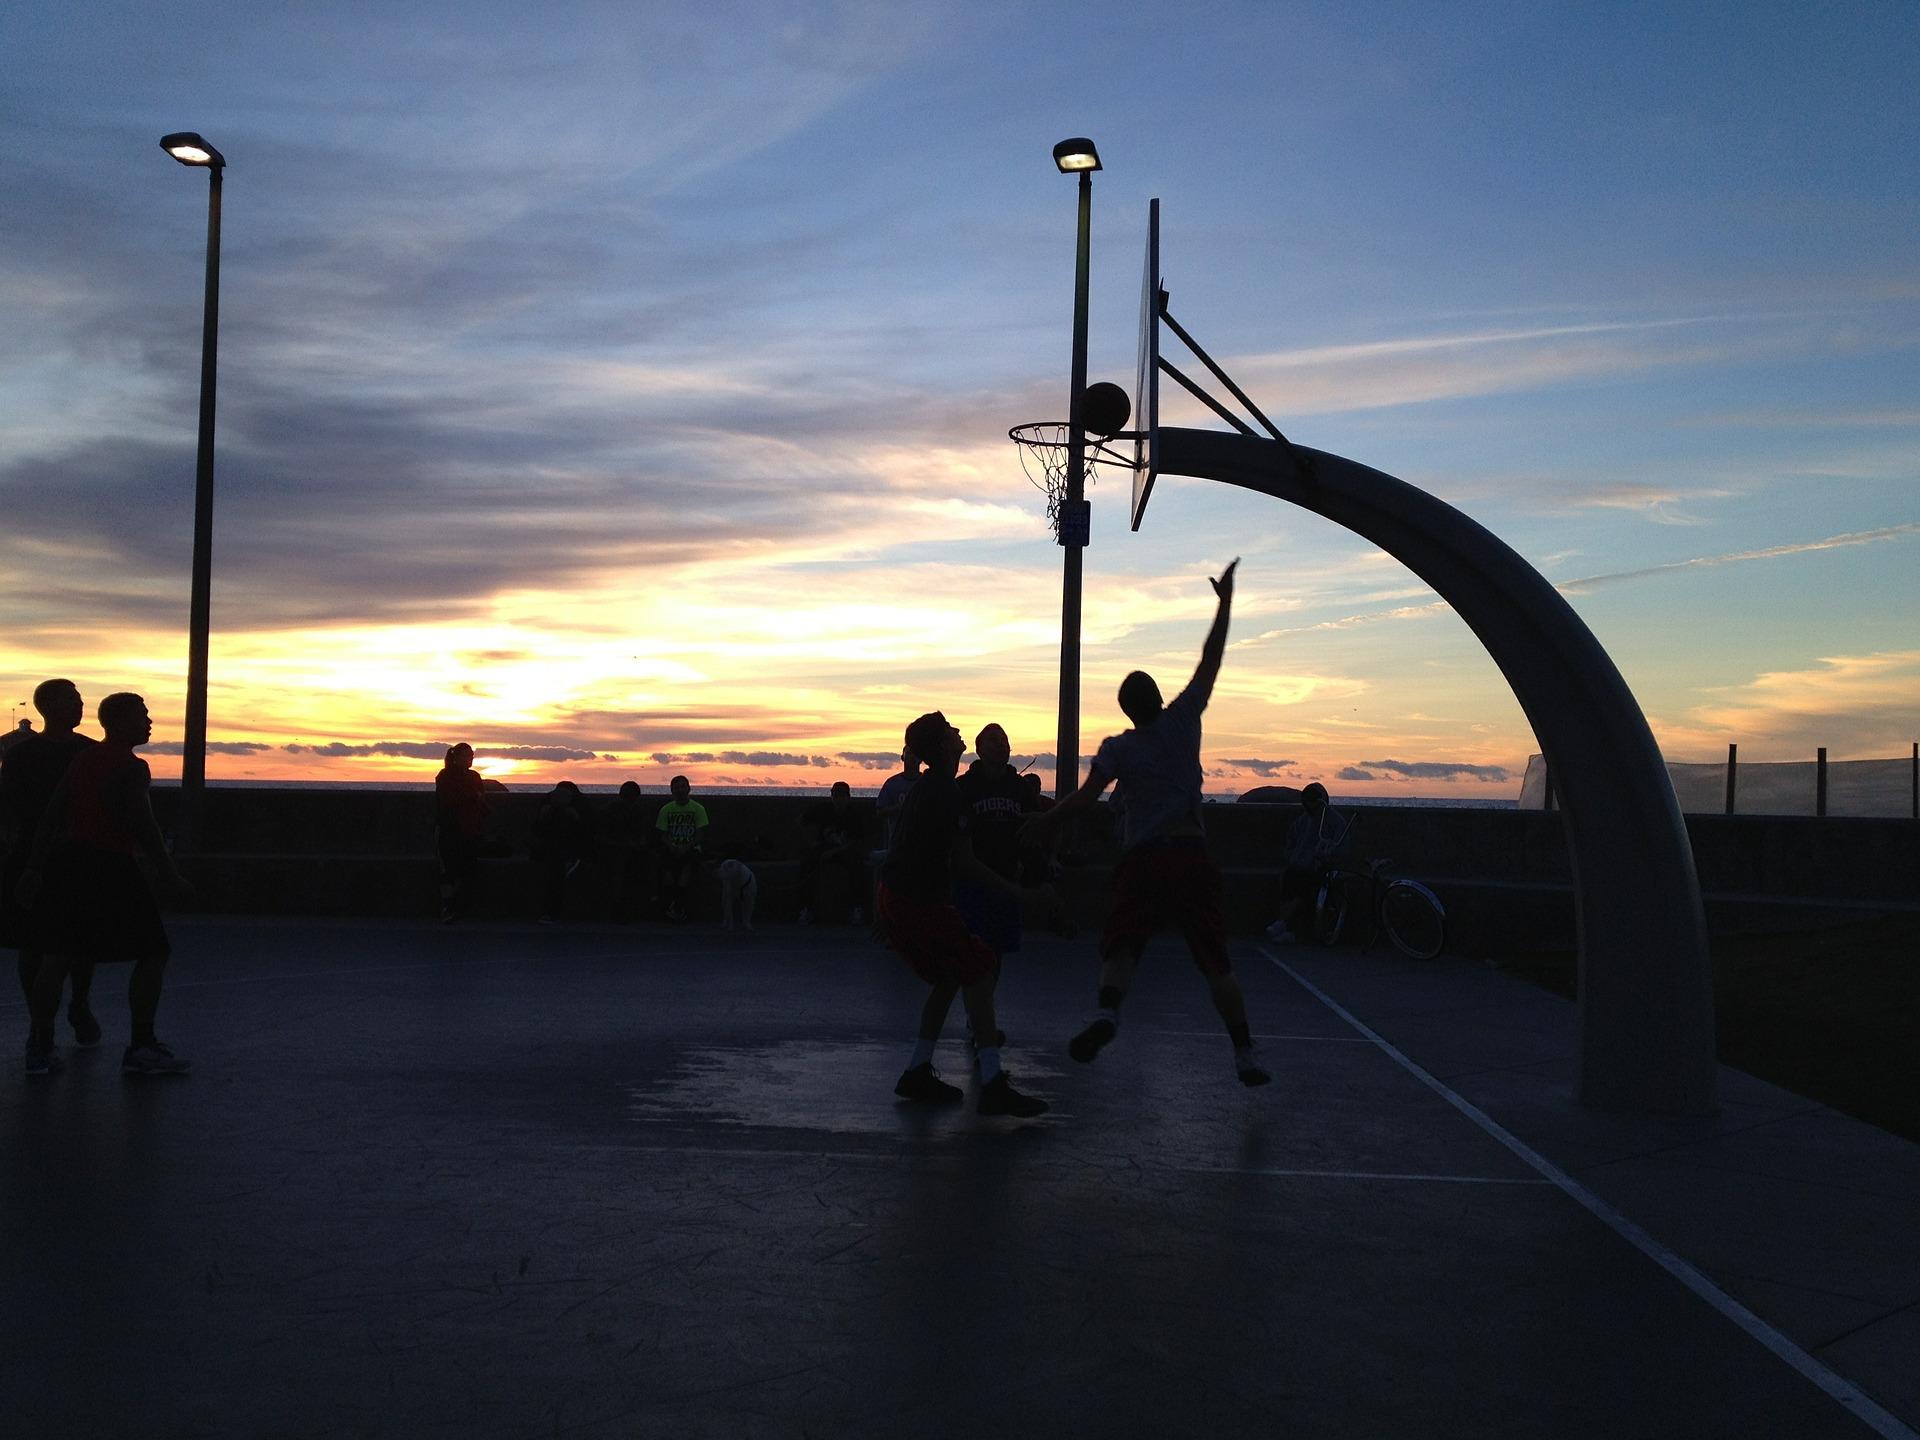 basketball-412603_1920.jpg